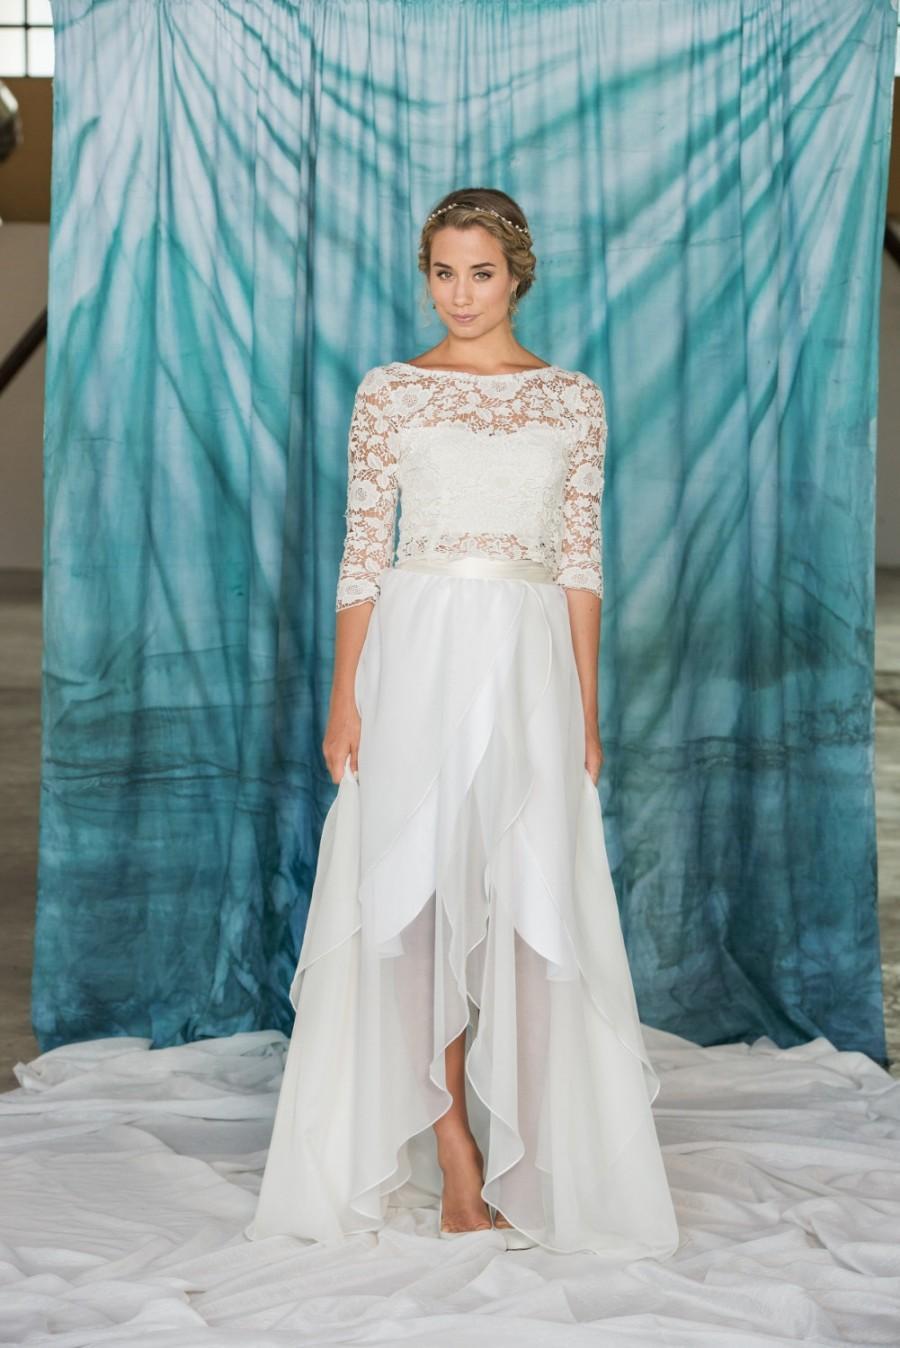 elegant wedding dresses new design simple elegant wedding dress lace square elegant wedding dresses option